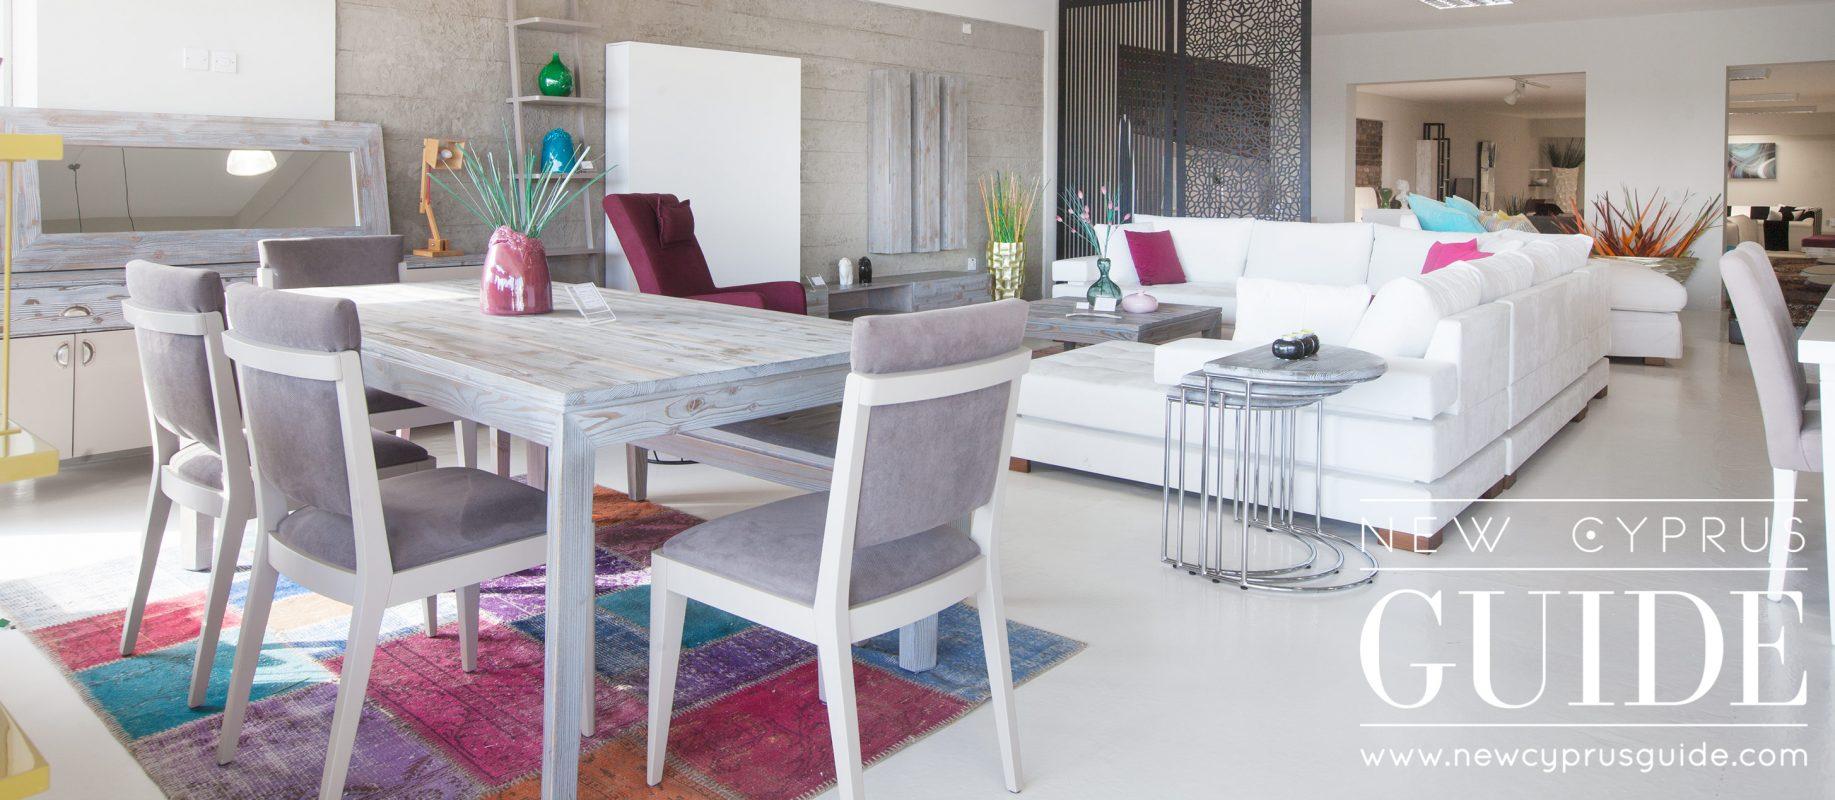 Guppa Home Design – New Cyprus Guide